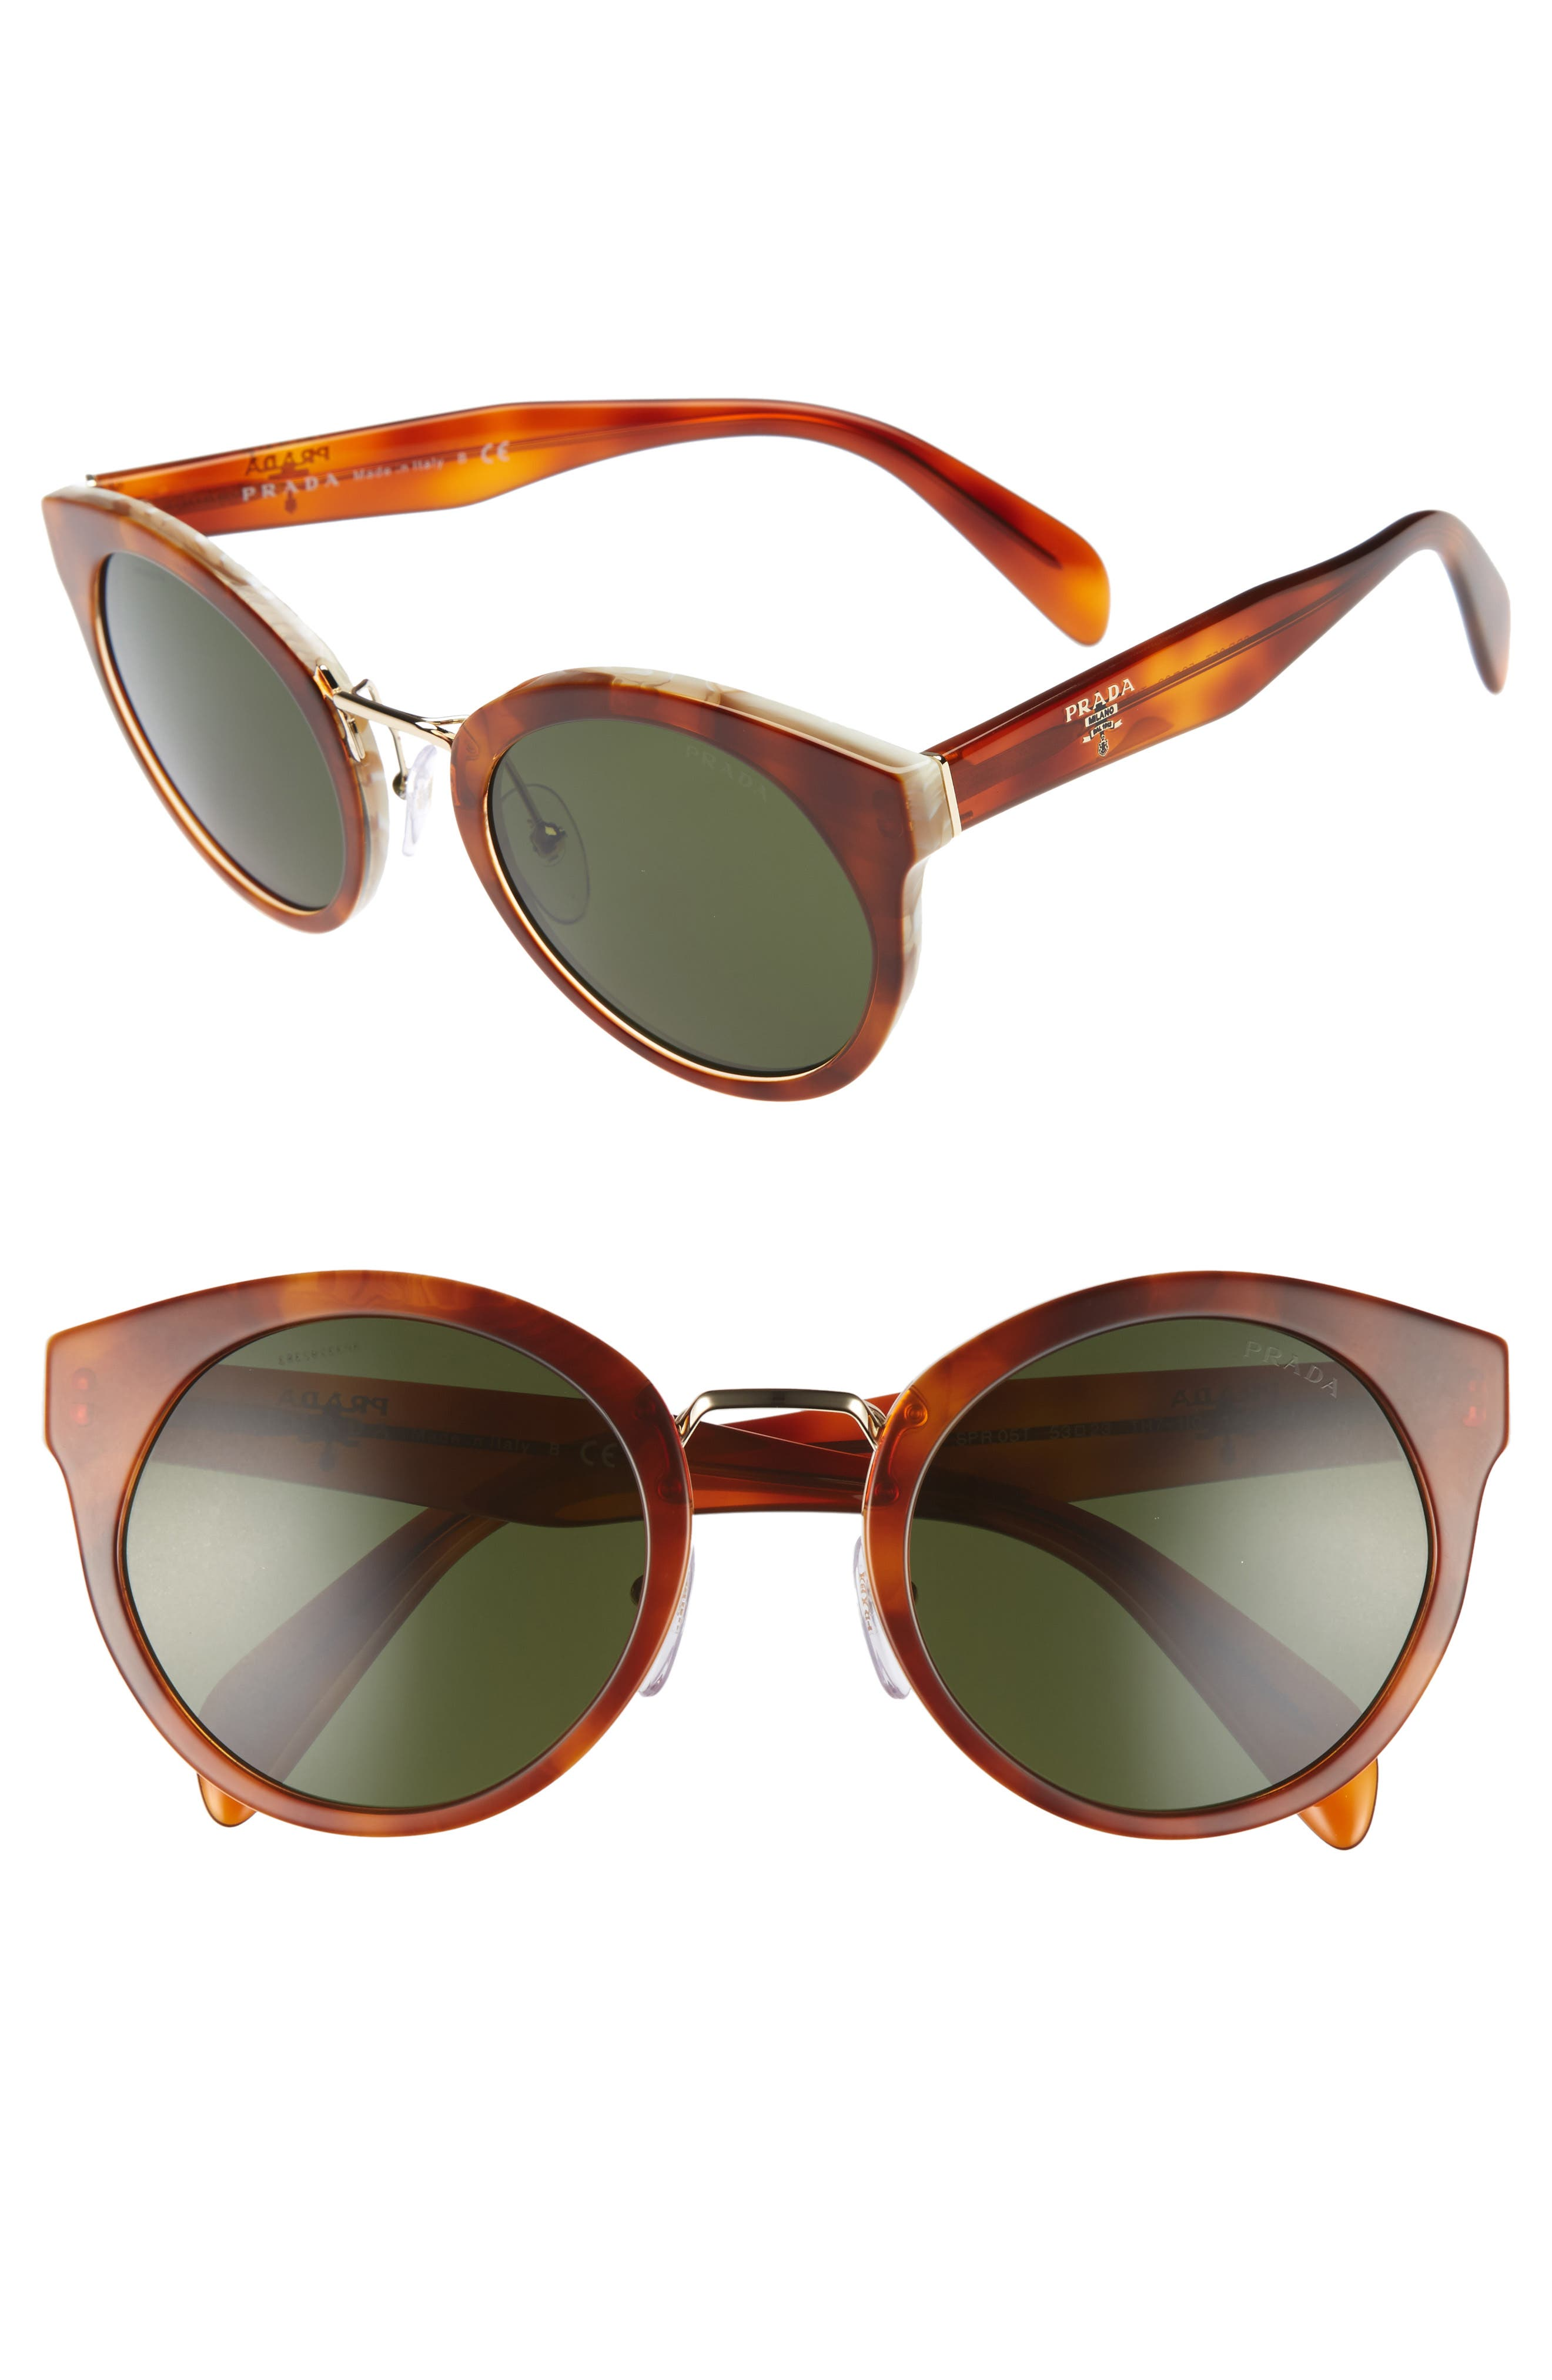 53mm Cat Eye Sunglasses,                             Main thumbnail 1, color,                             200